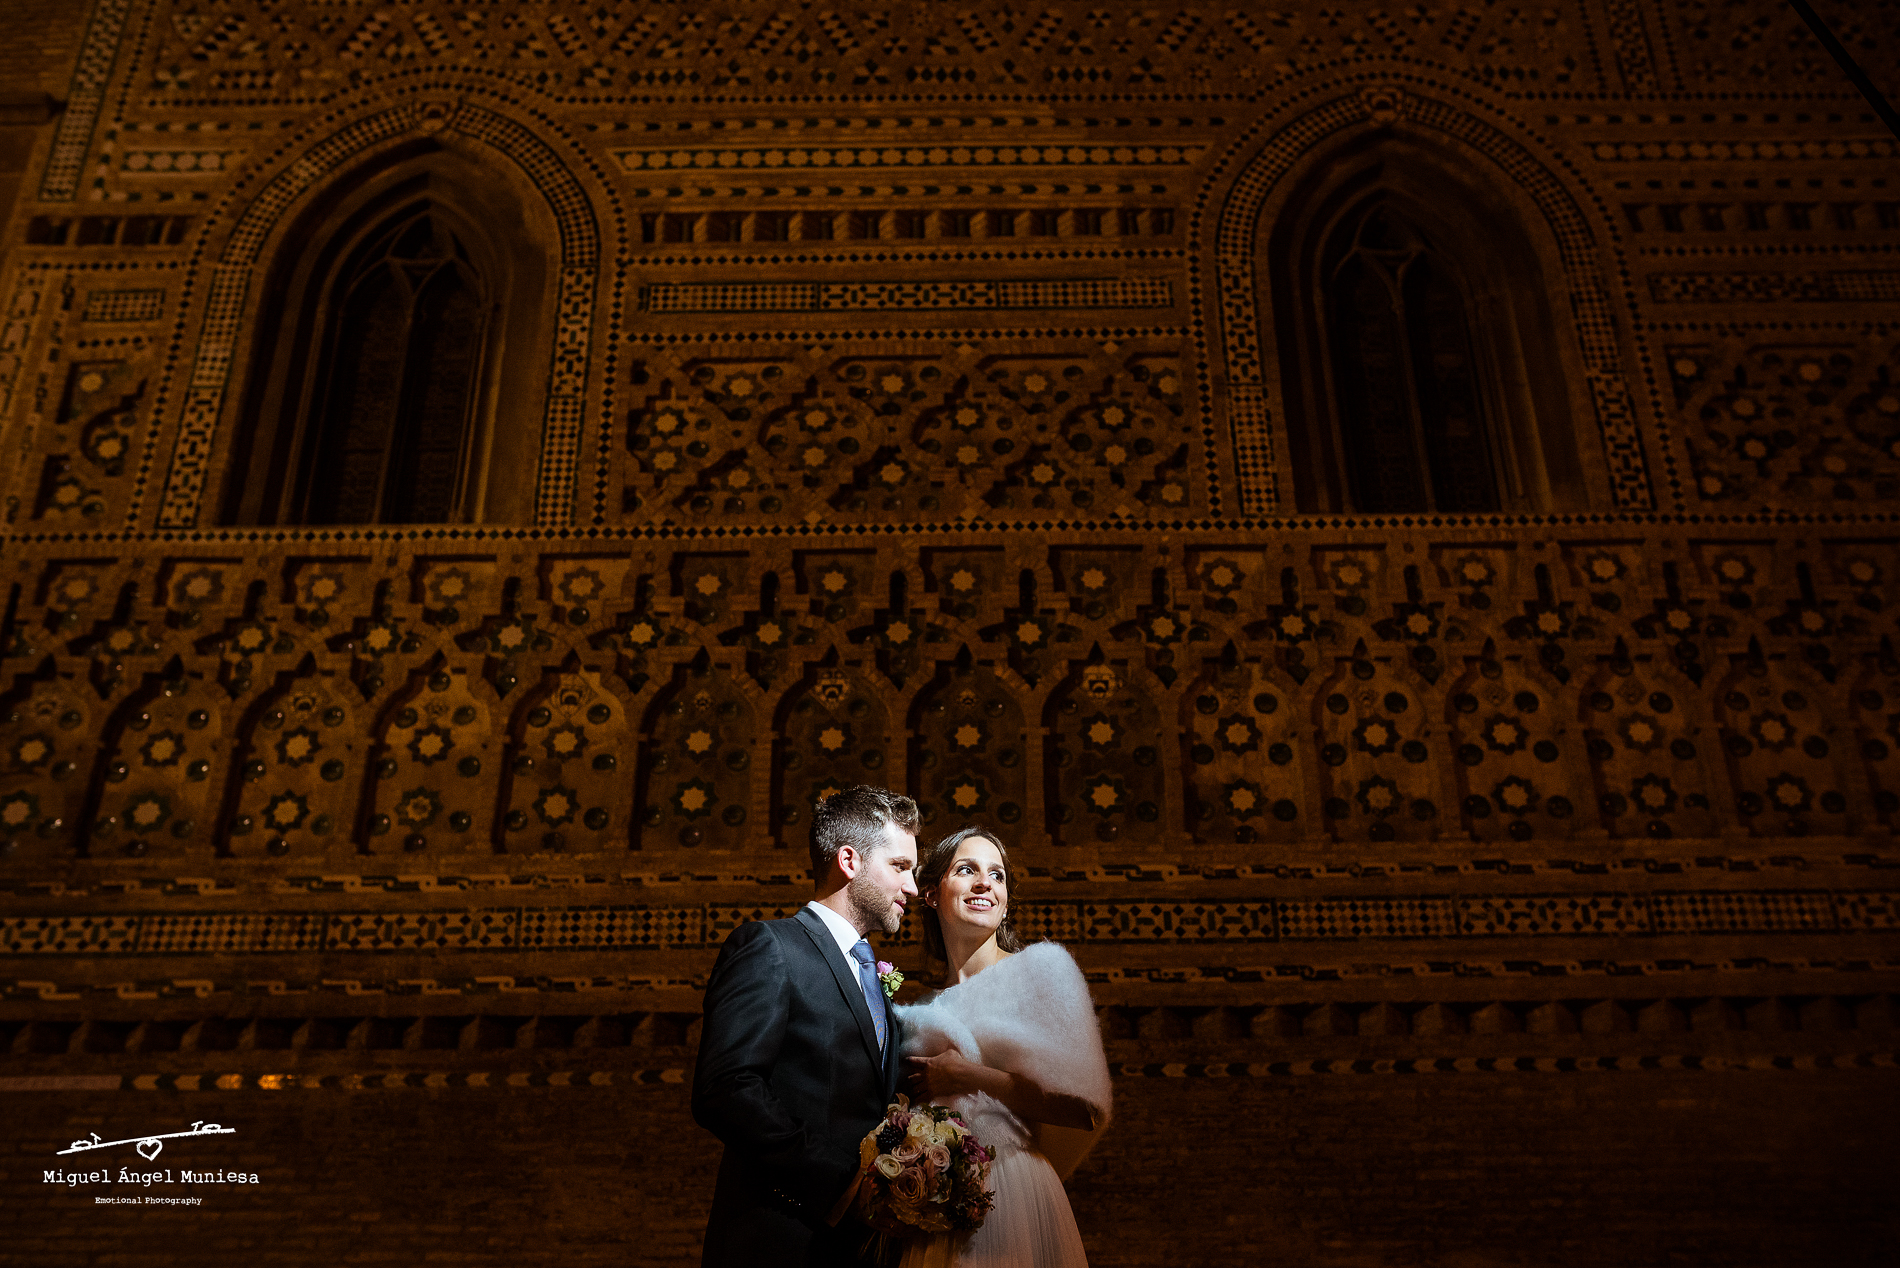 miguel angel muniesa, fotografo boda Teruel, fotografo boda navarra, fotografo boda zaragoza, fotografo boda soria, miguel angel muniesa emotional photography_19